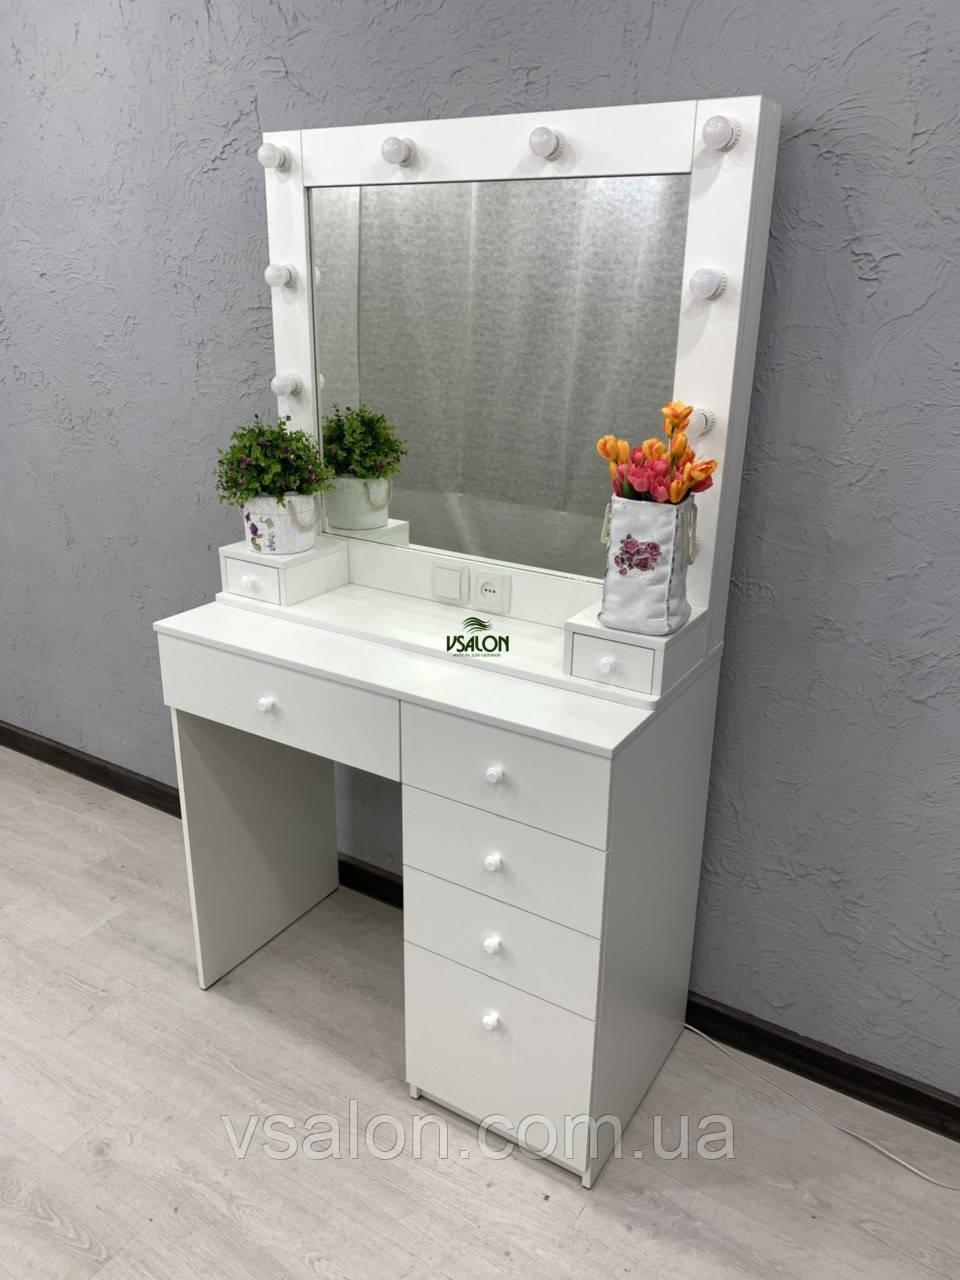 Стол для визажиста с подсветкой V410